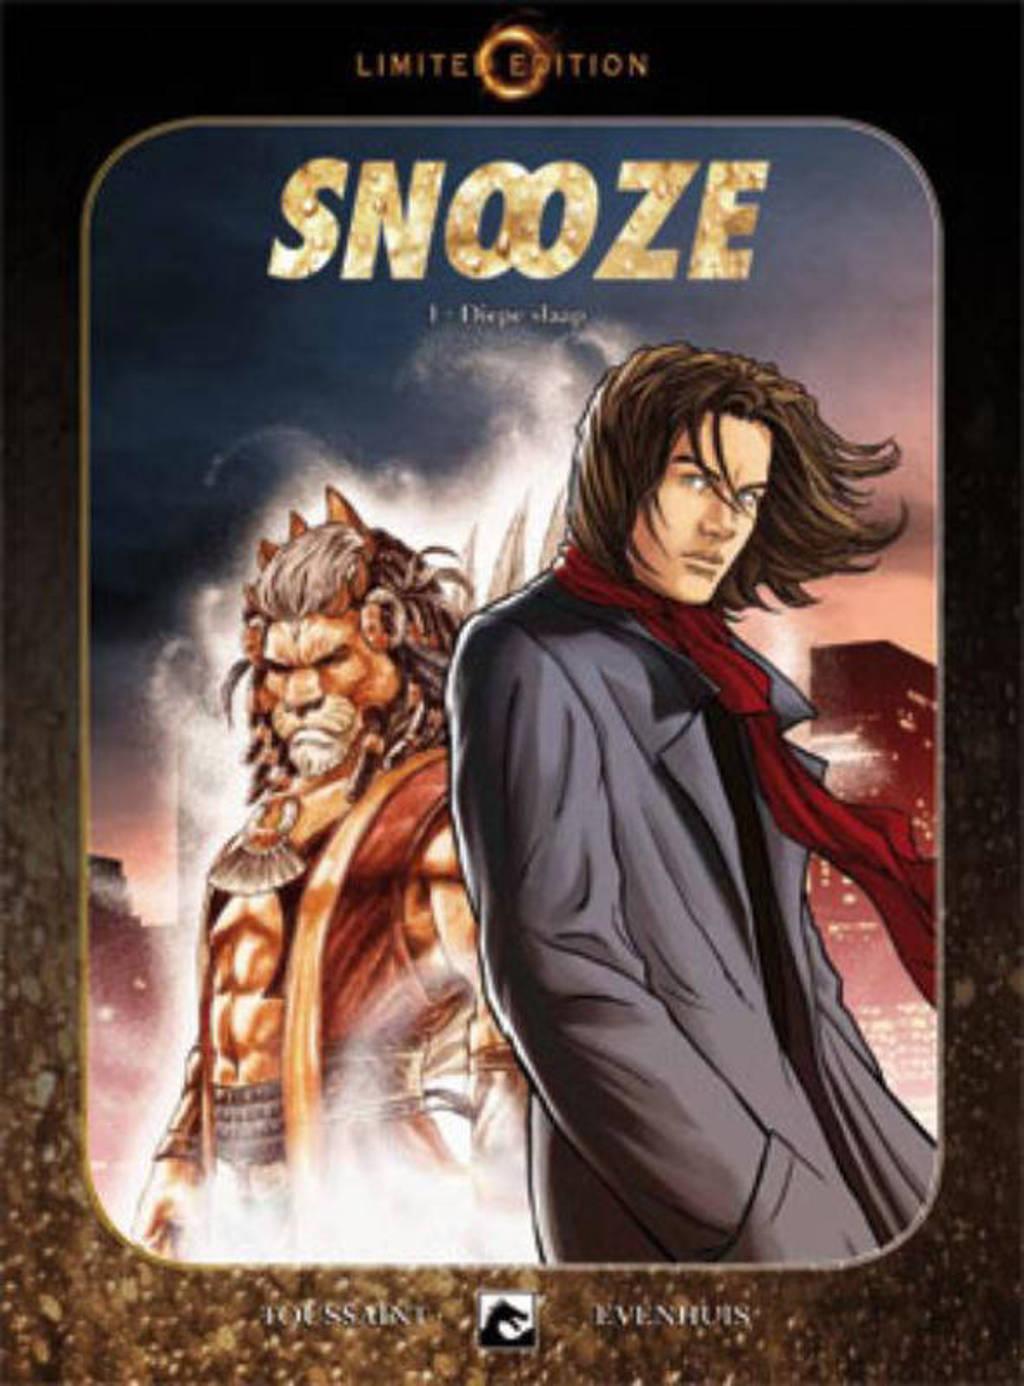 Graphic Novel Collection: Snooze 1 Diepe slaap - Kid Toussaint